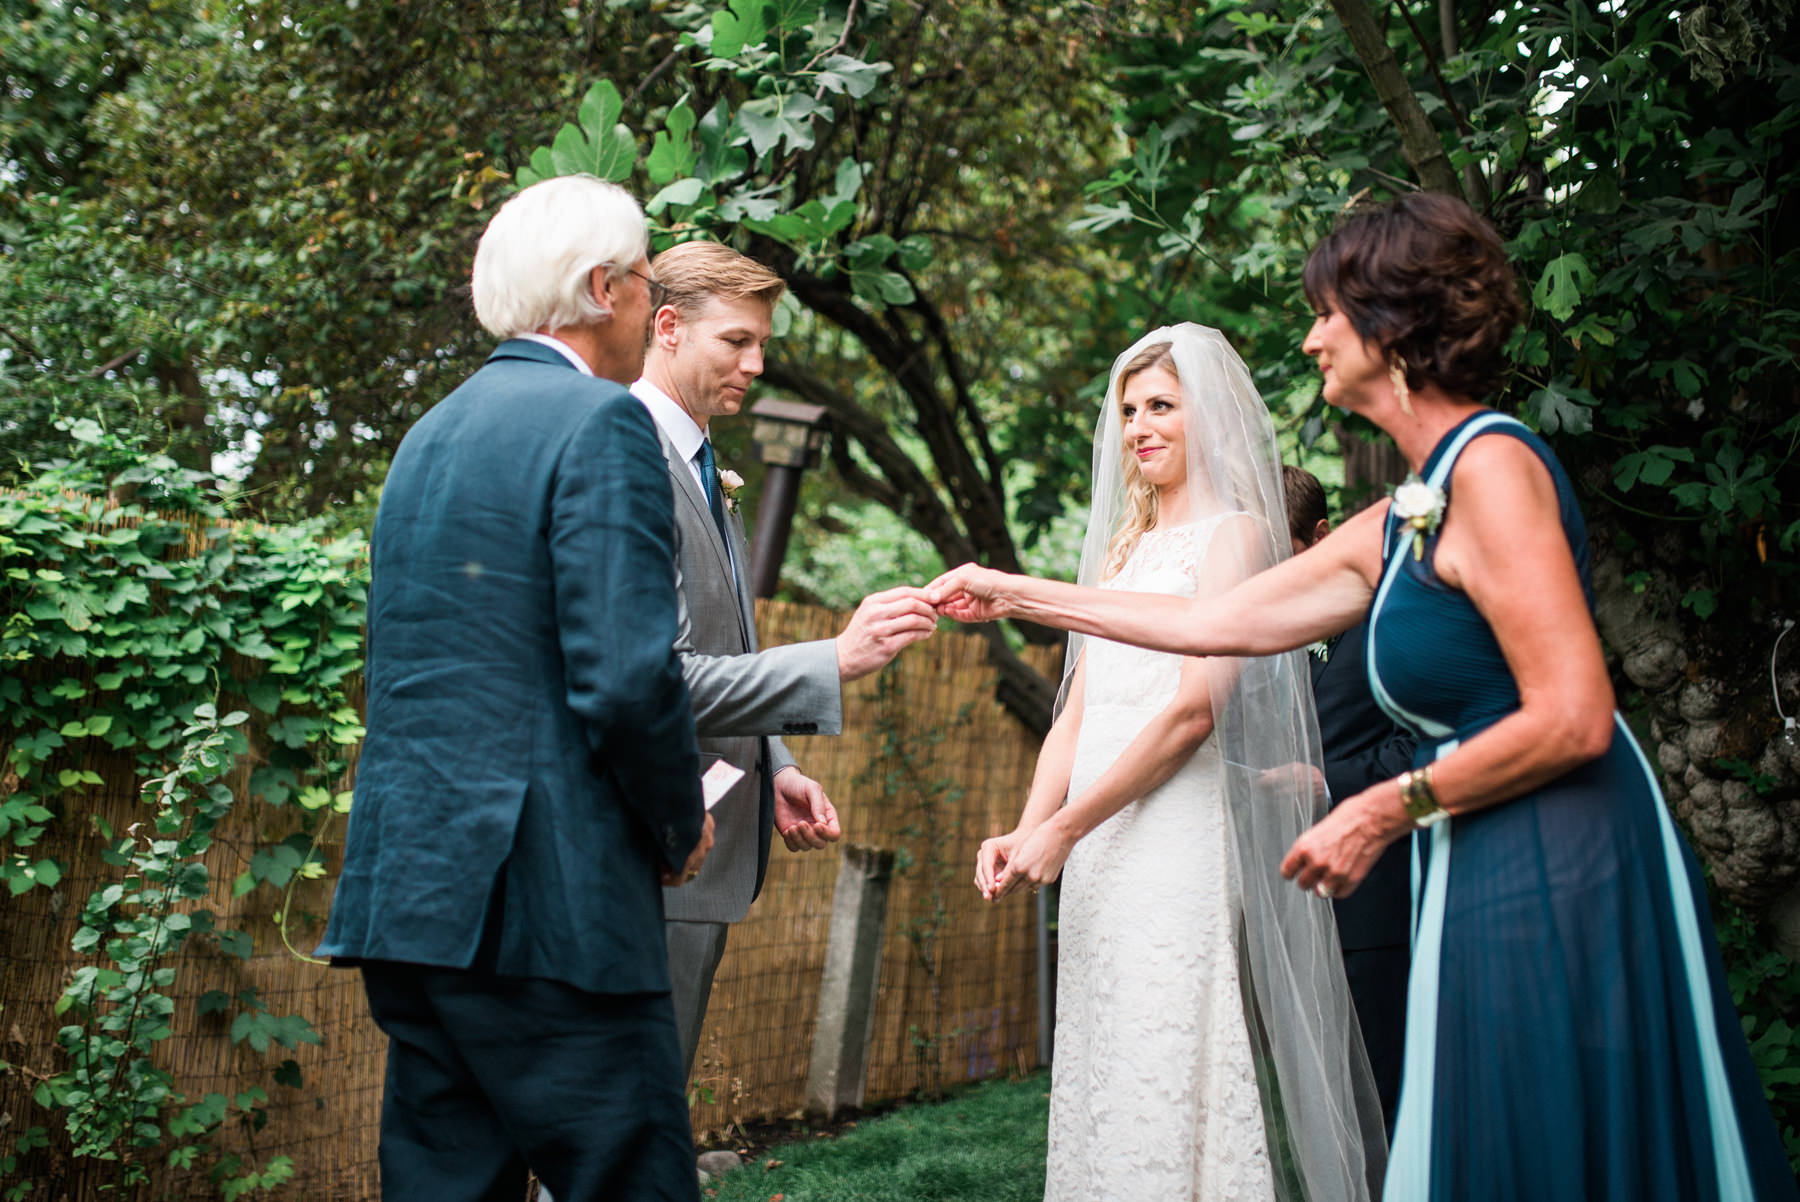 212-outdoor-wedding-ceremony-at-the-corson-building.jpg